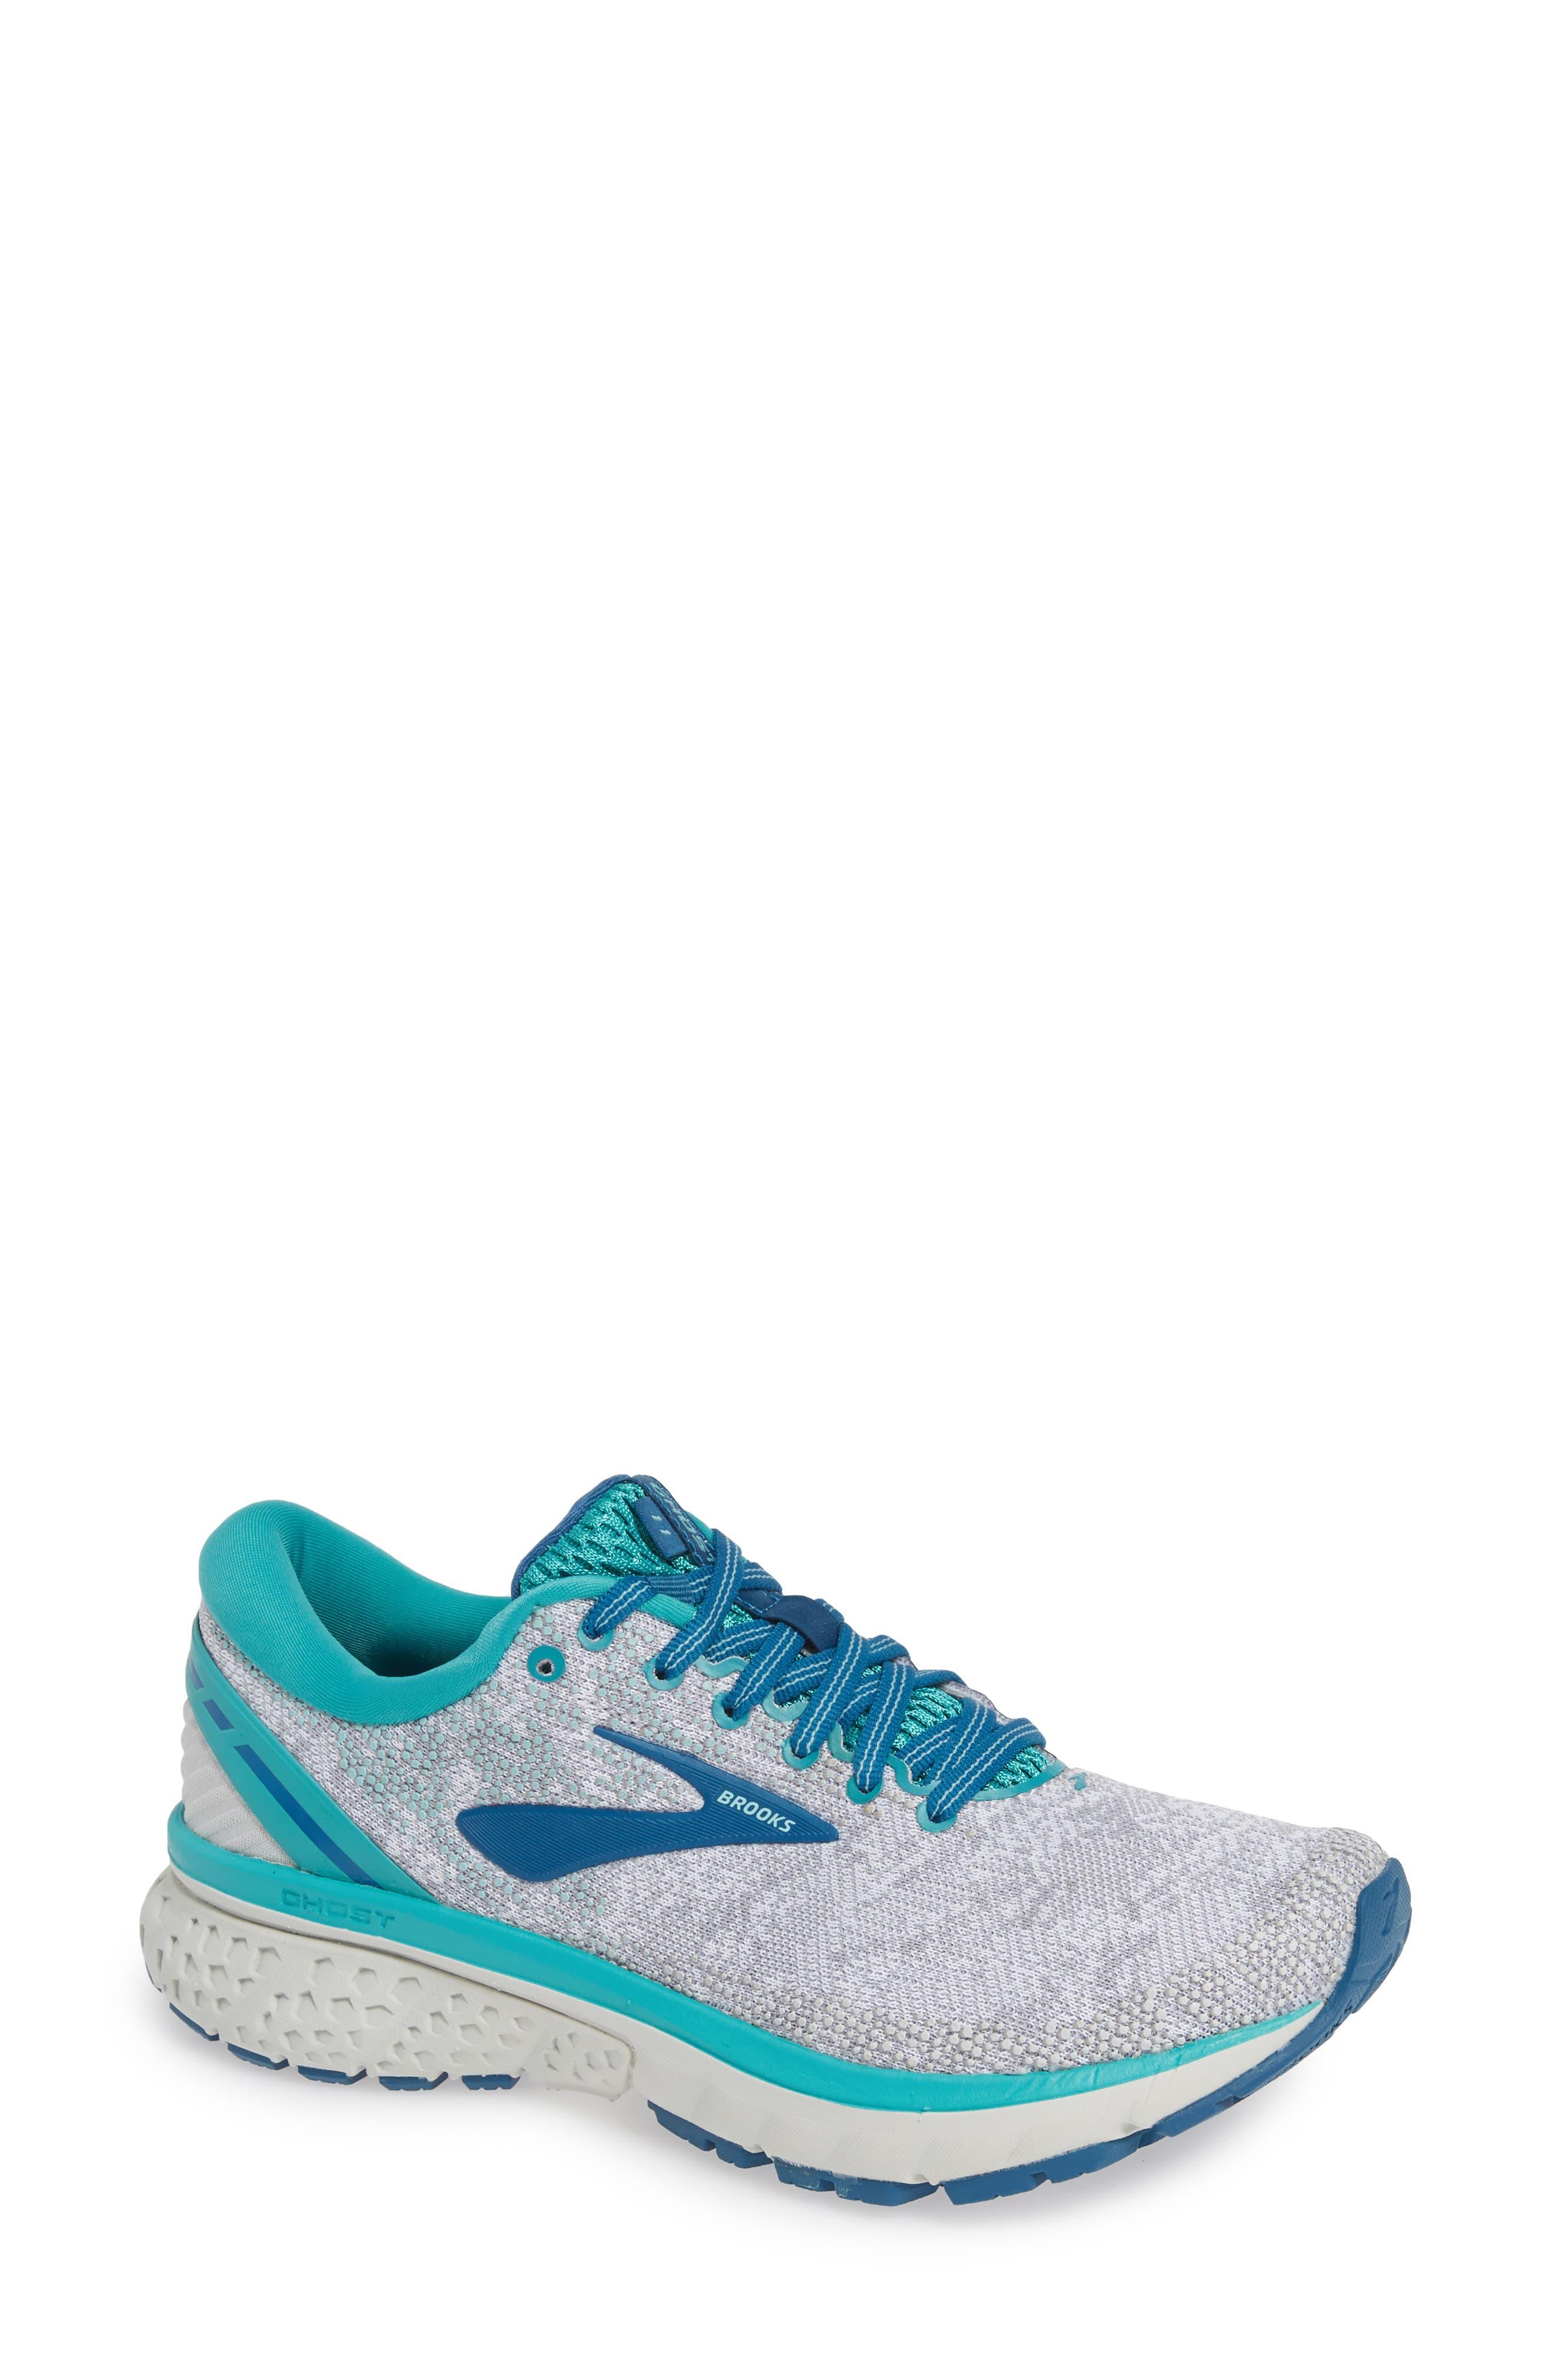 Brooks Ghost 11 Running Shoe, Blue/green